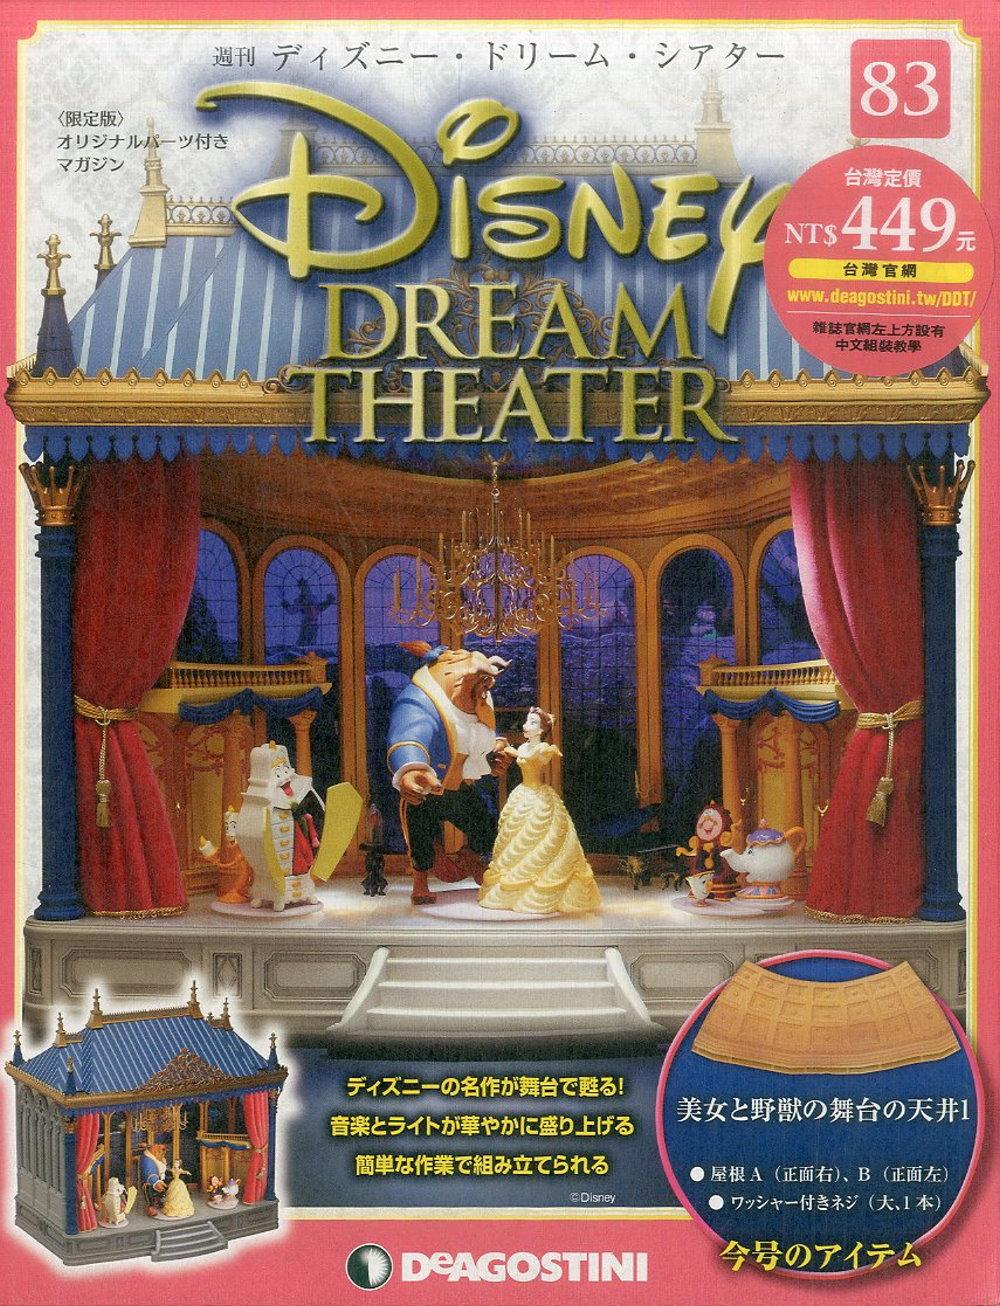 Disney Dream Theater 迪士尼夢幻劇場 (日文版) 2018/5/29第83期